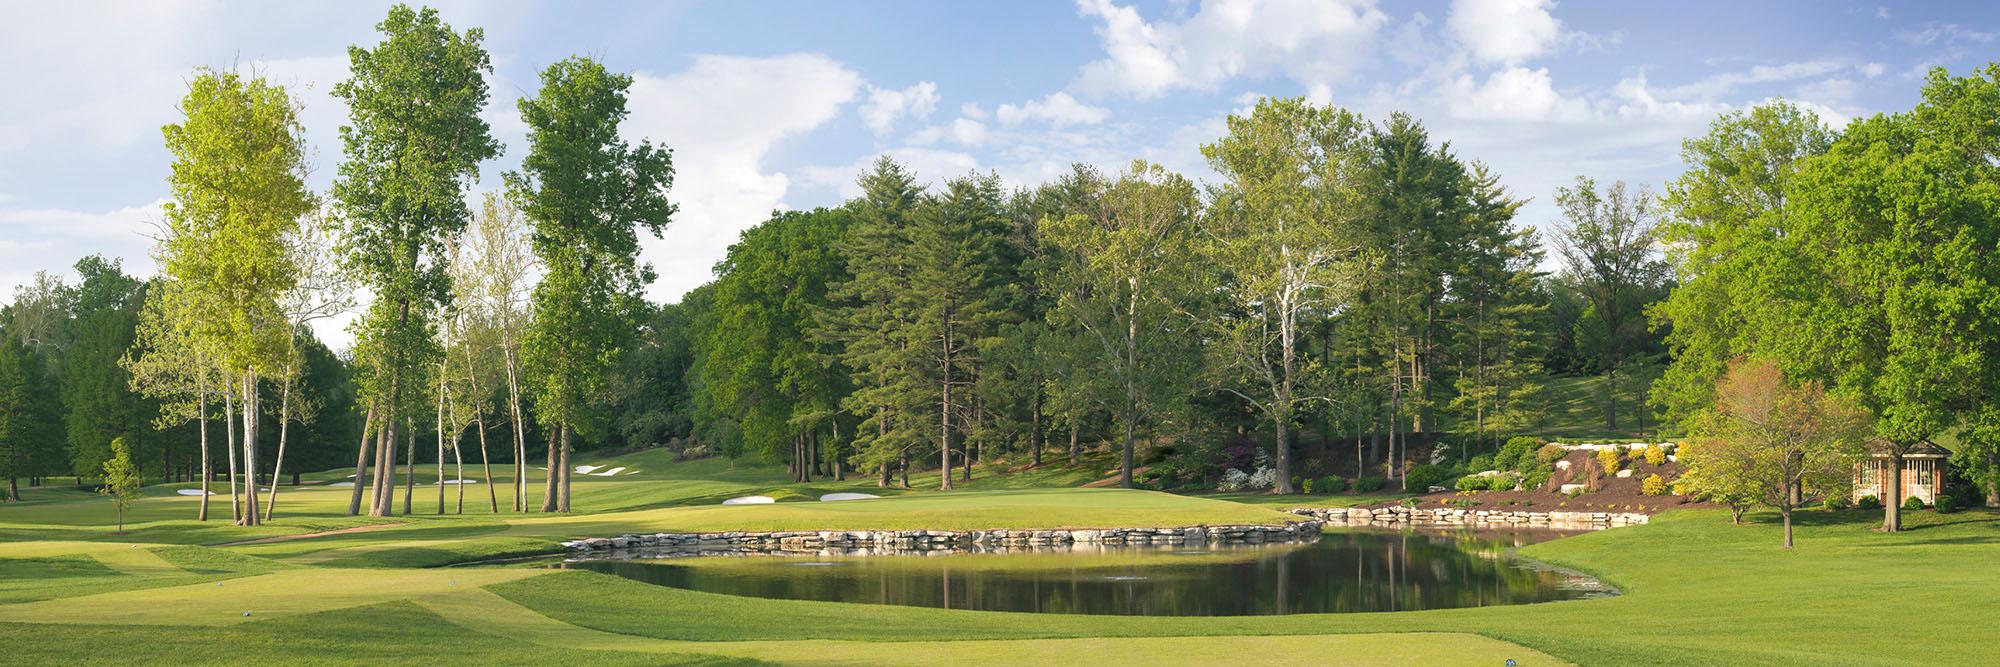 Golf Course Image - Bellerive No. 3